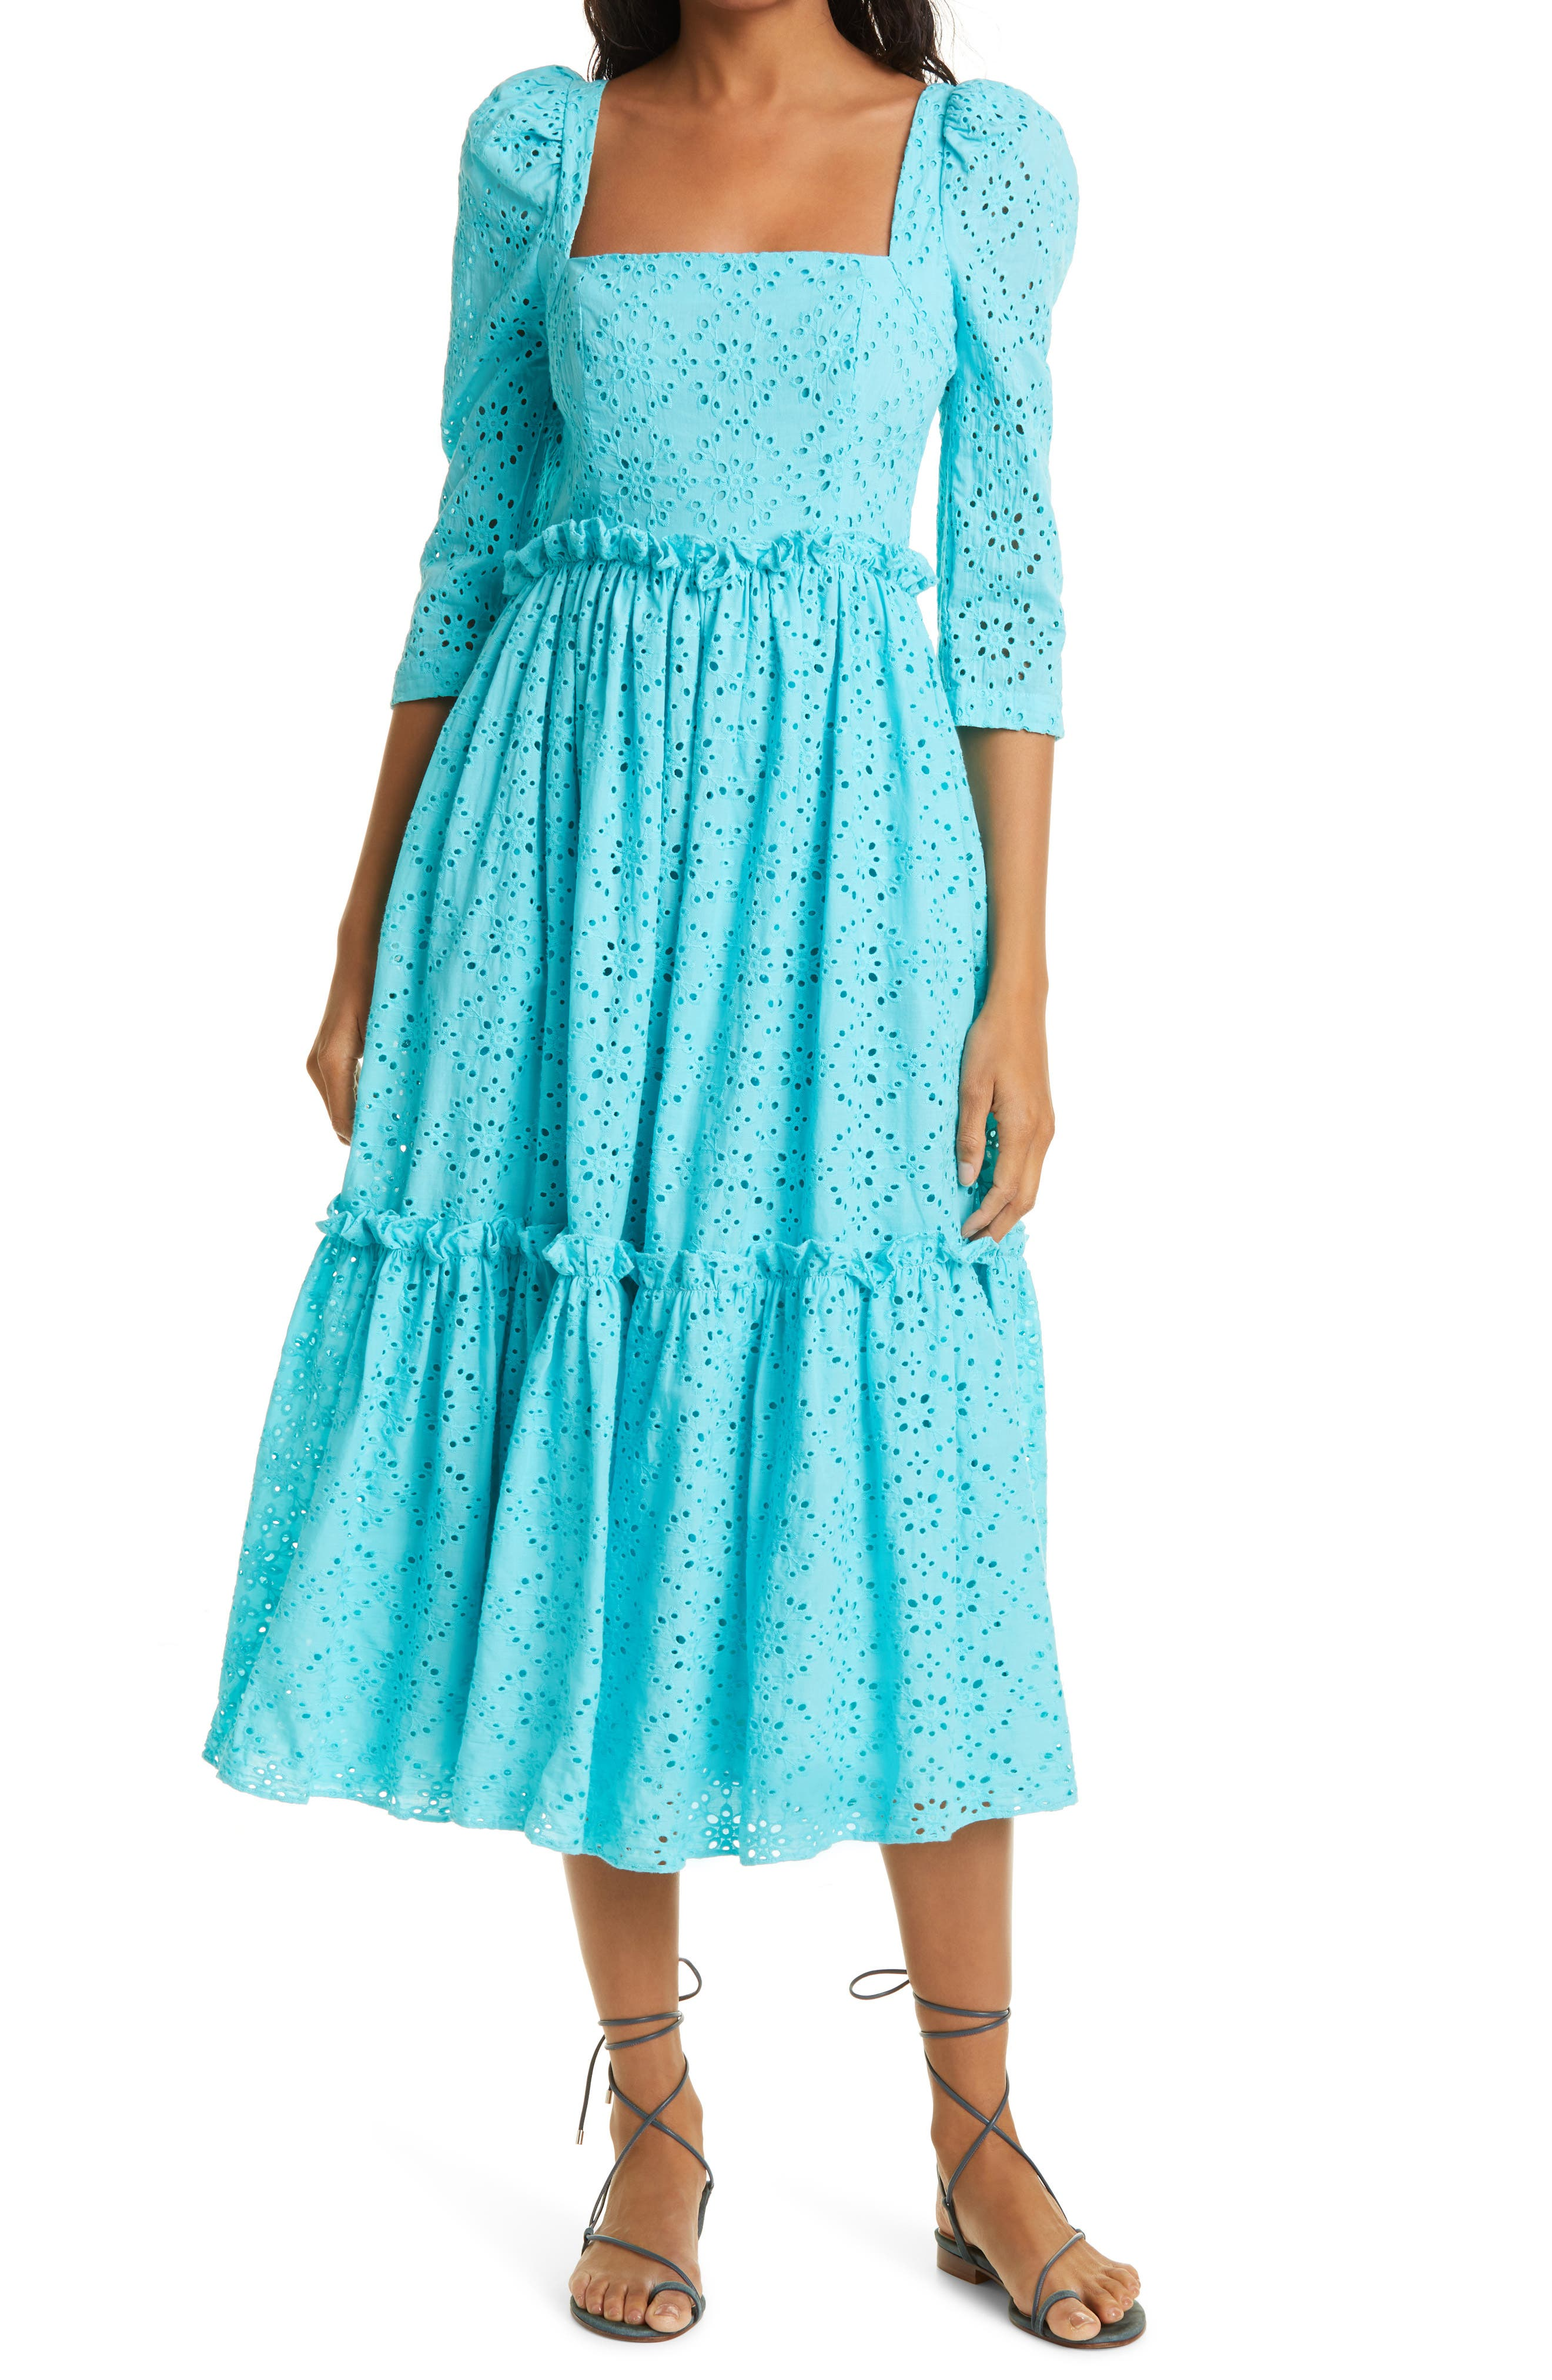 Blue Hill Cotton Eyelet Dress